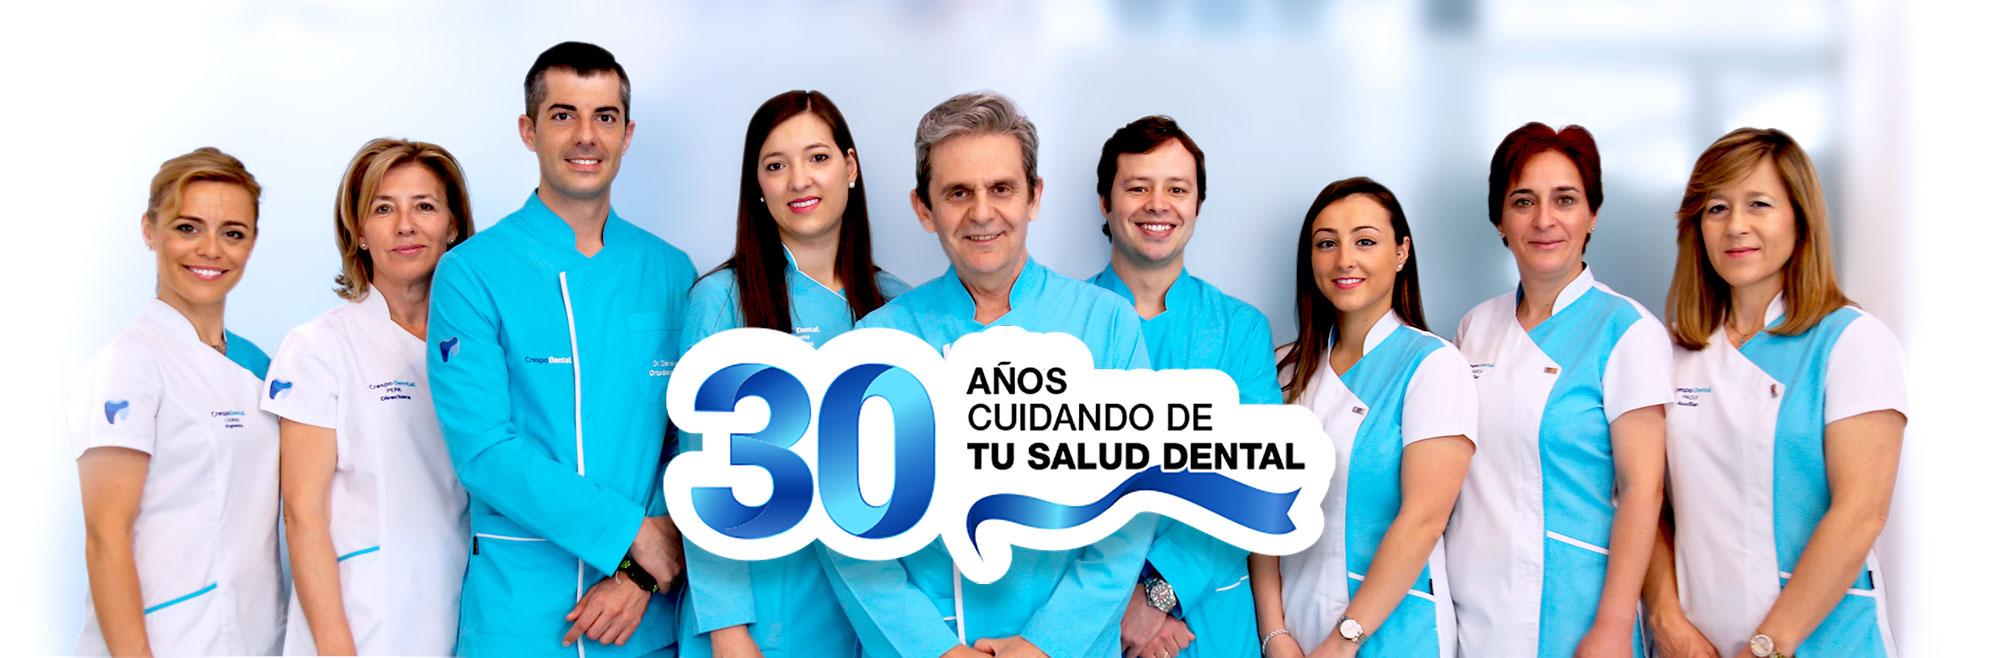 Clínica dental en Albacete